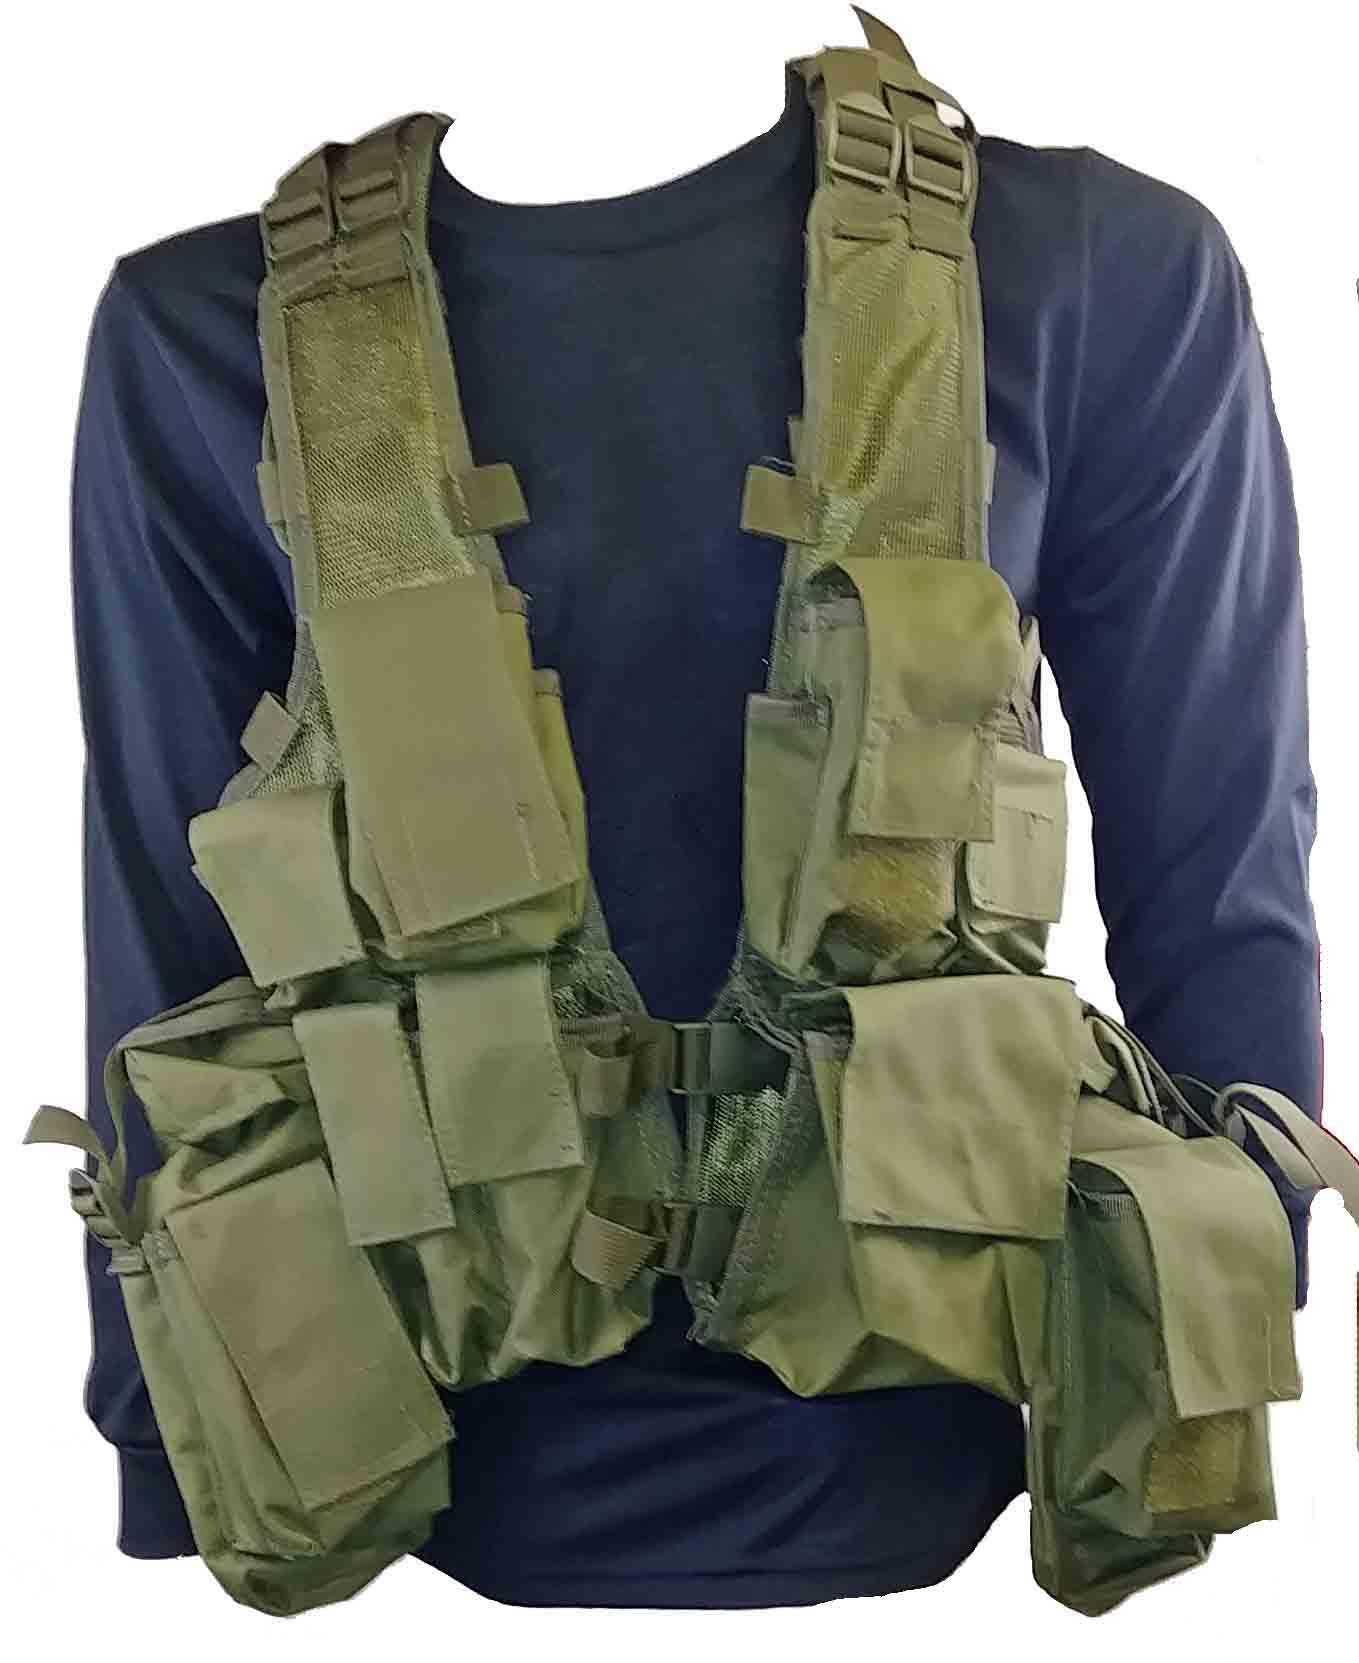 Olive drab tactical vest